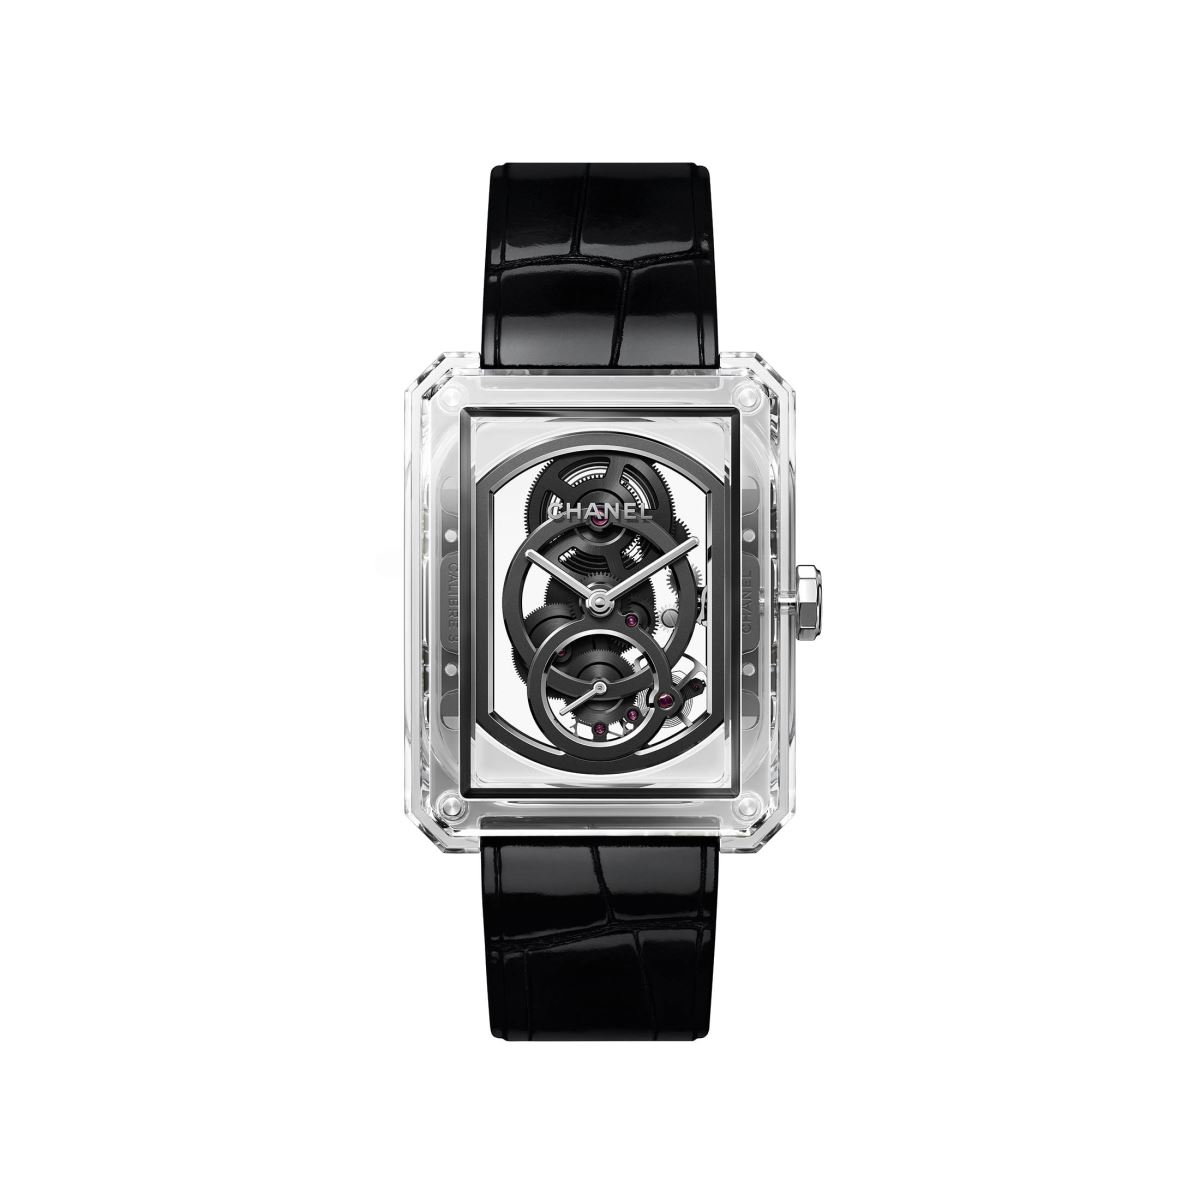 Đồng hồ Chanel Boy•Friend Skeleton X-Ray